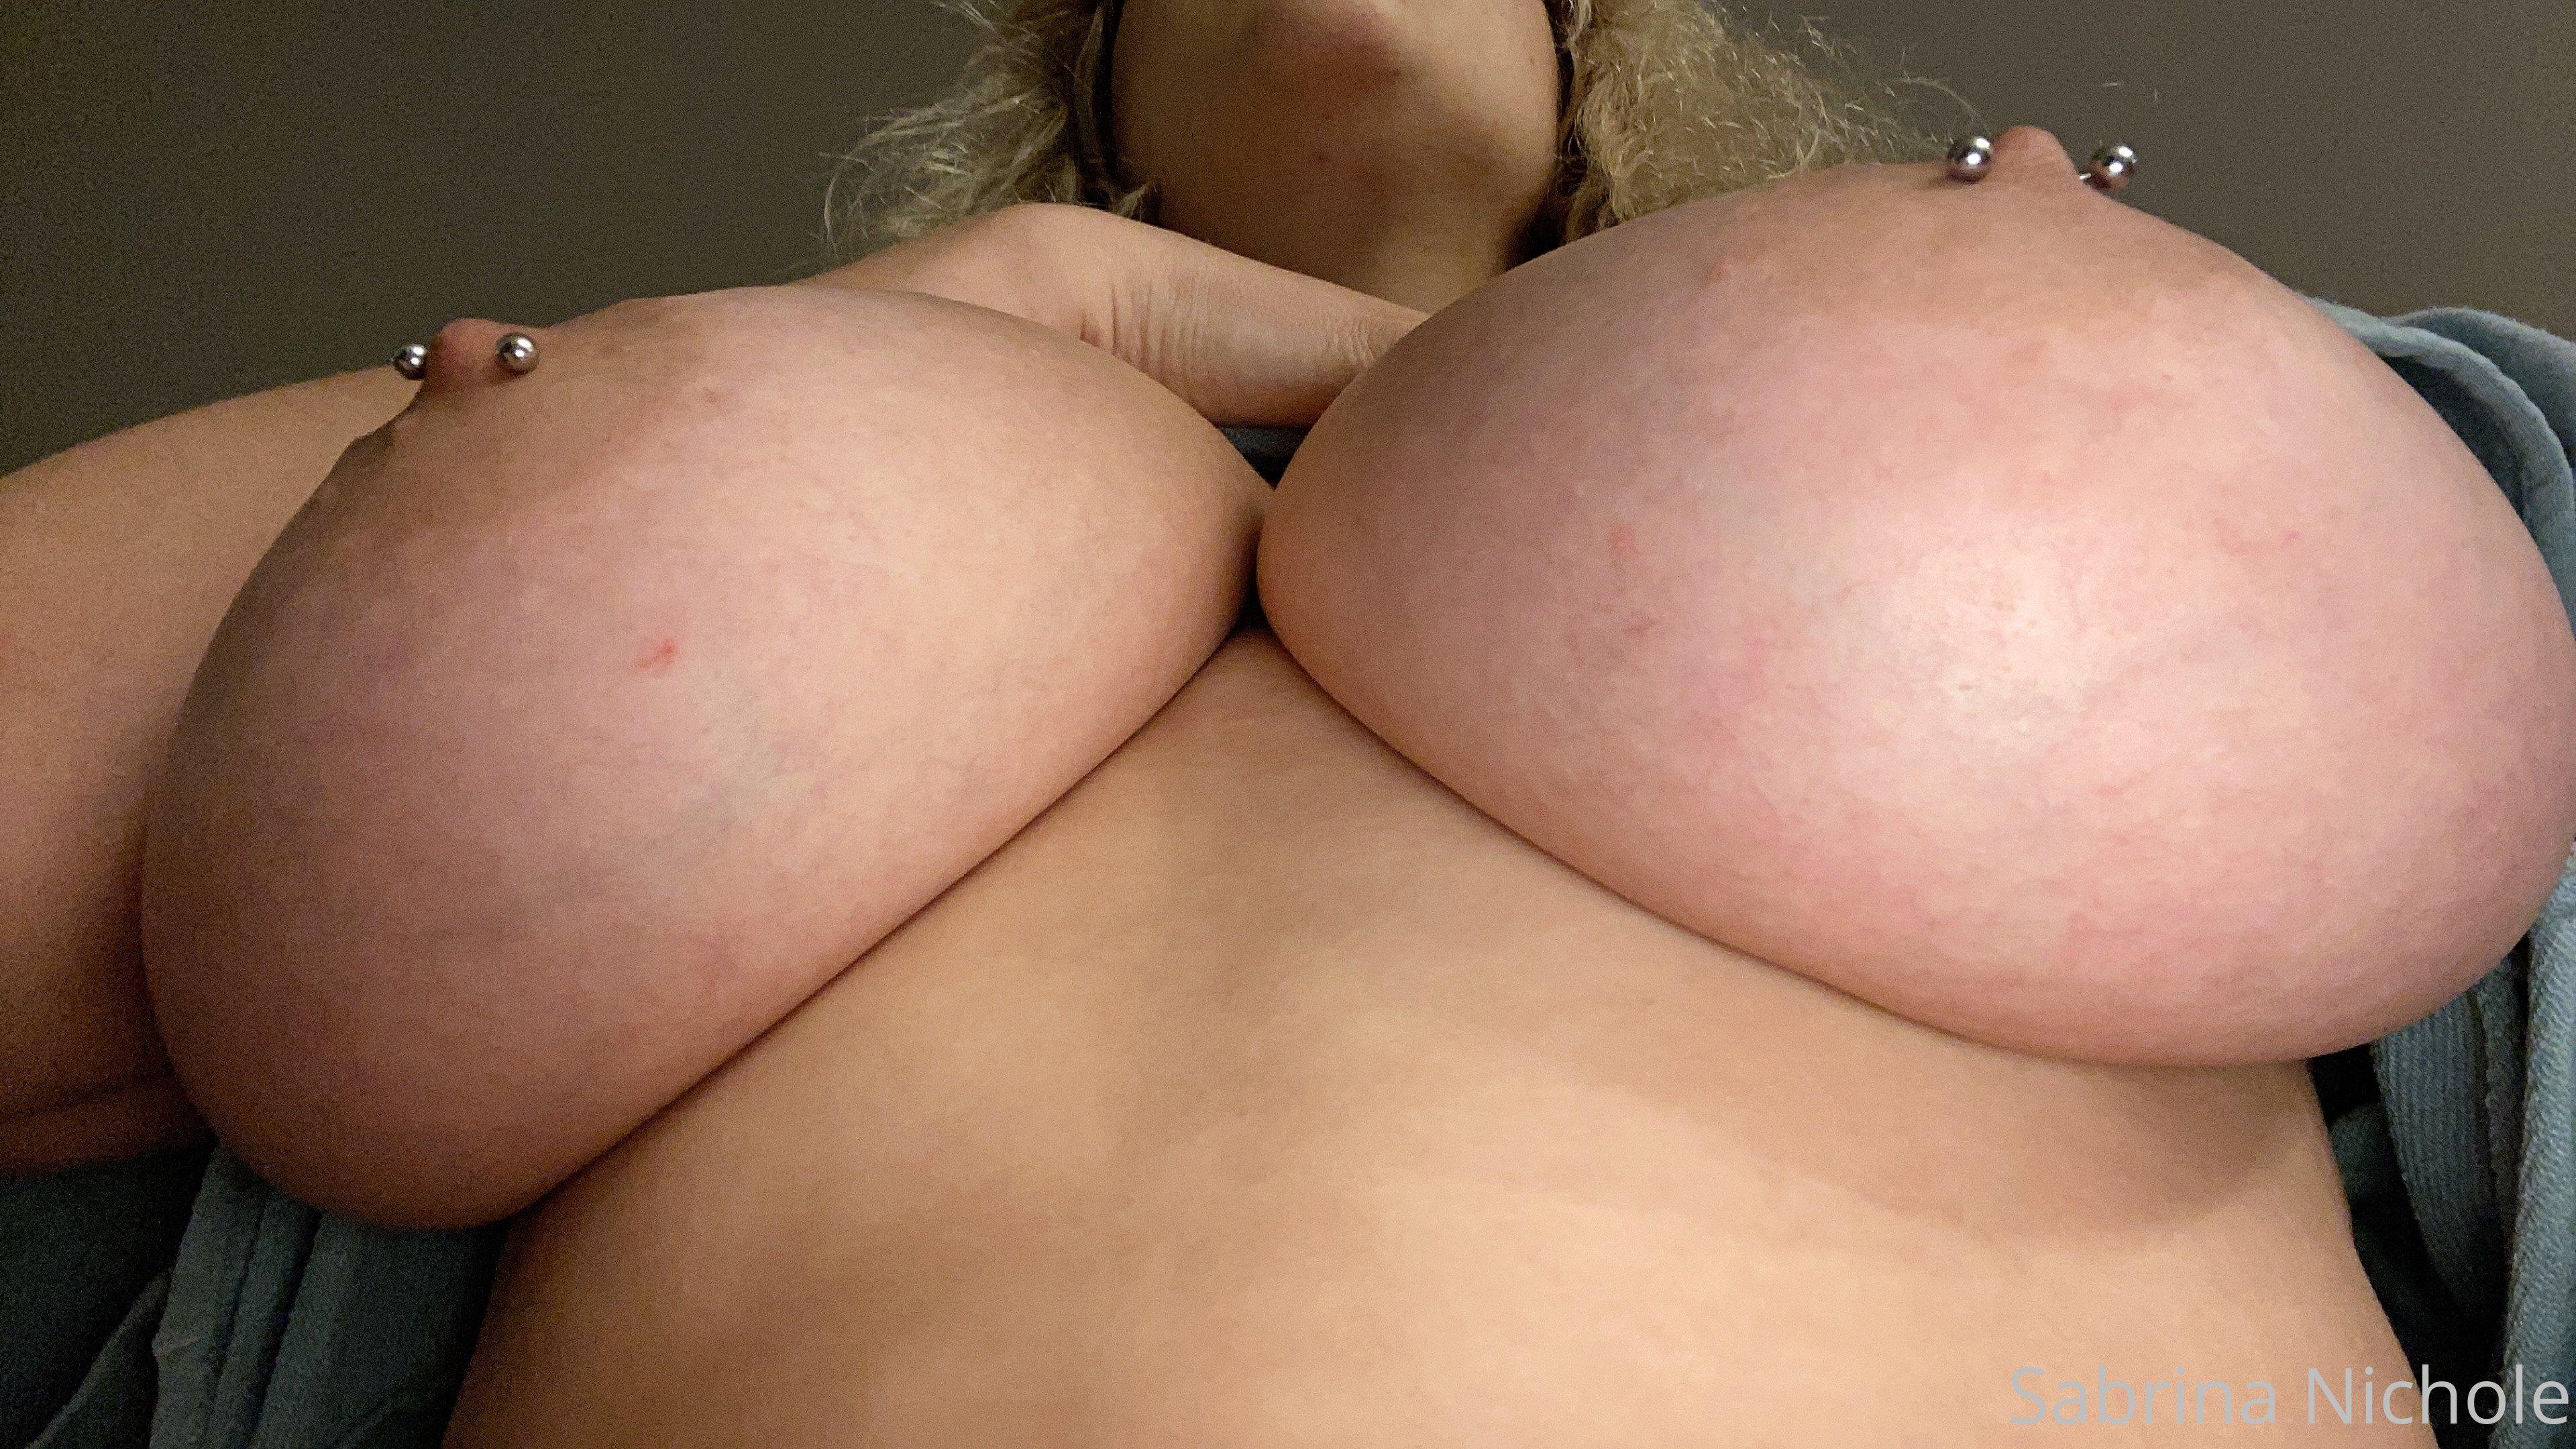 Sabrina Nichole 0101